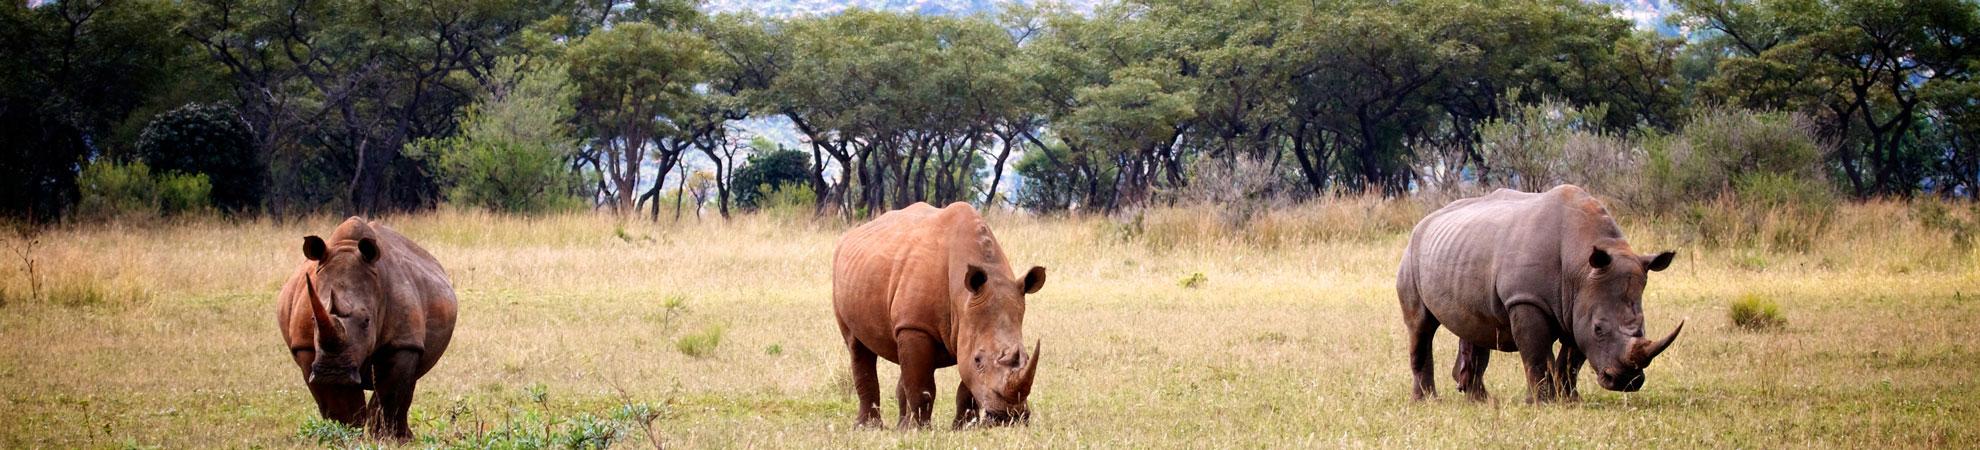 Safari Photo Kenya